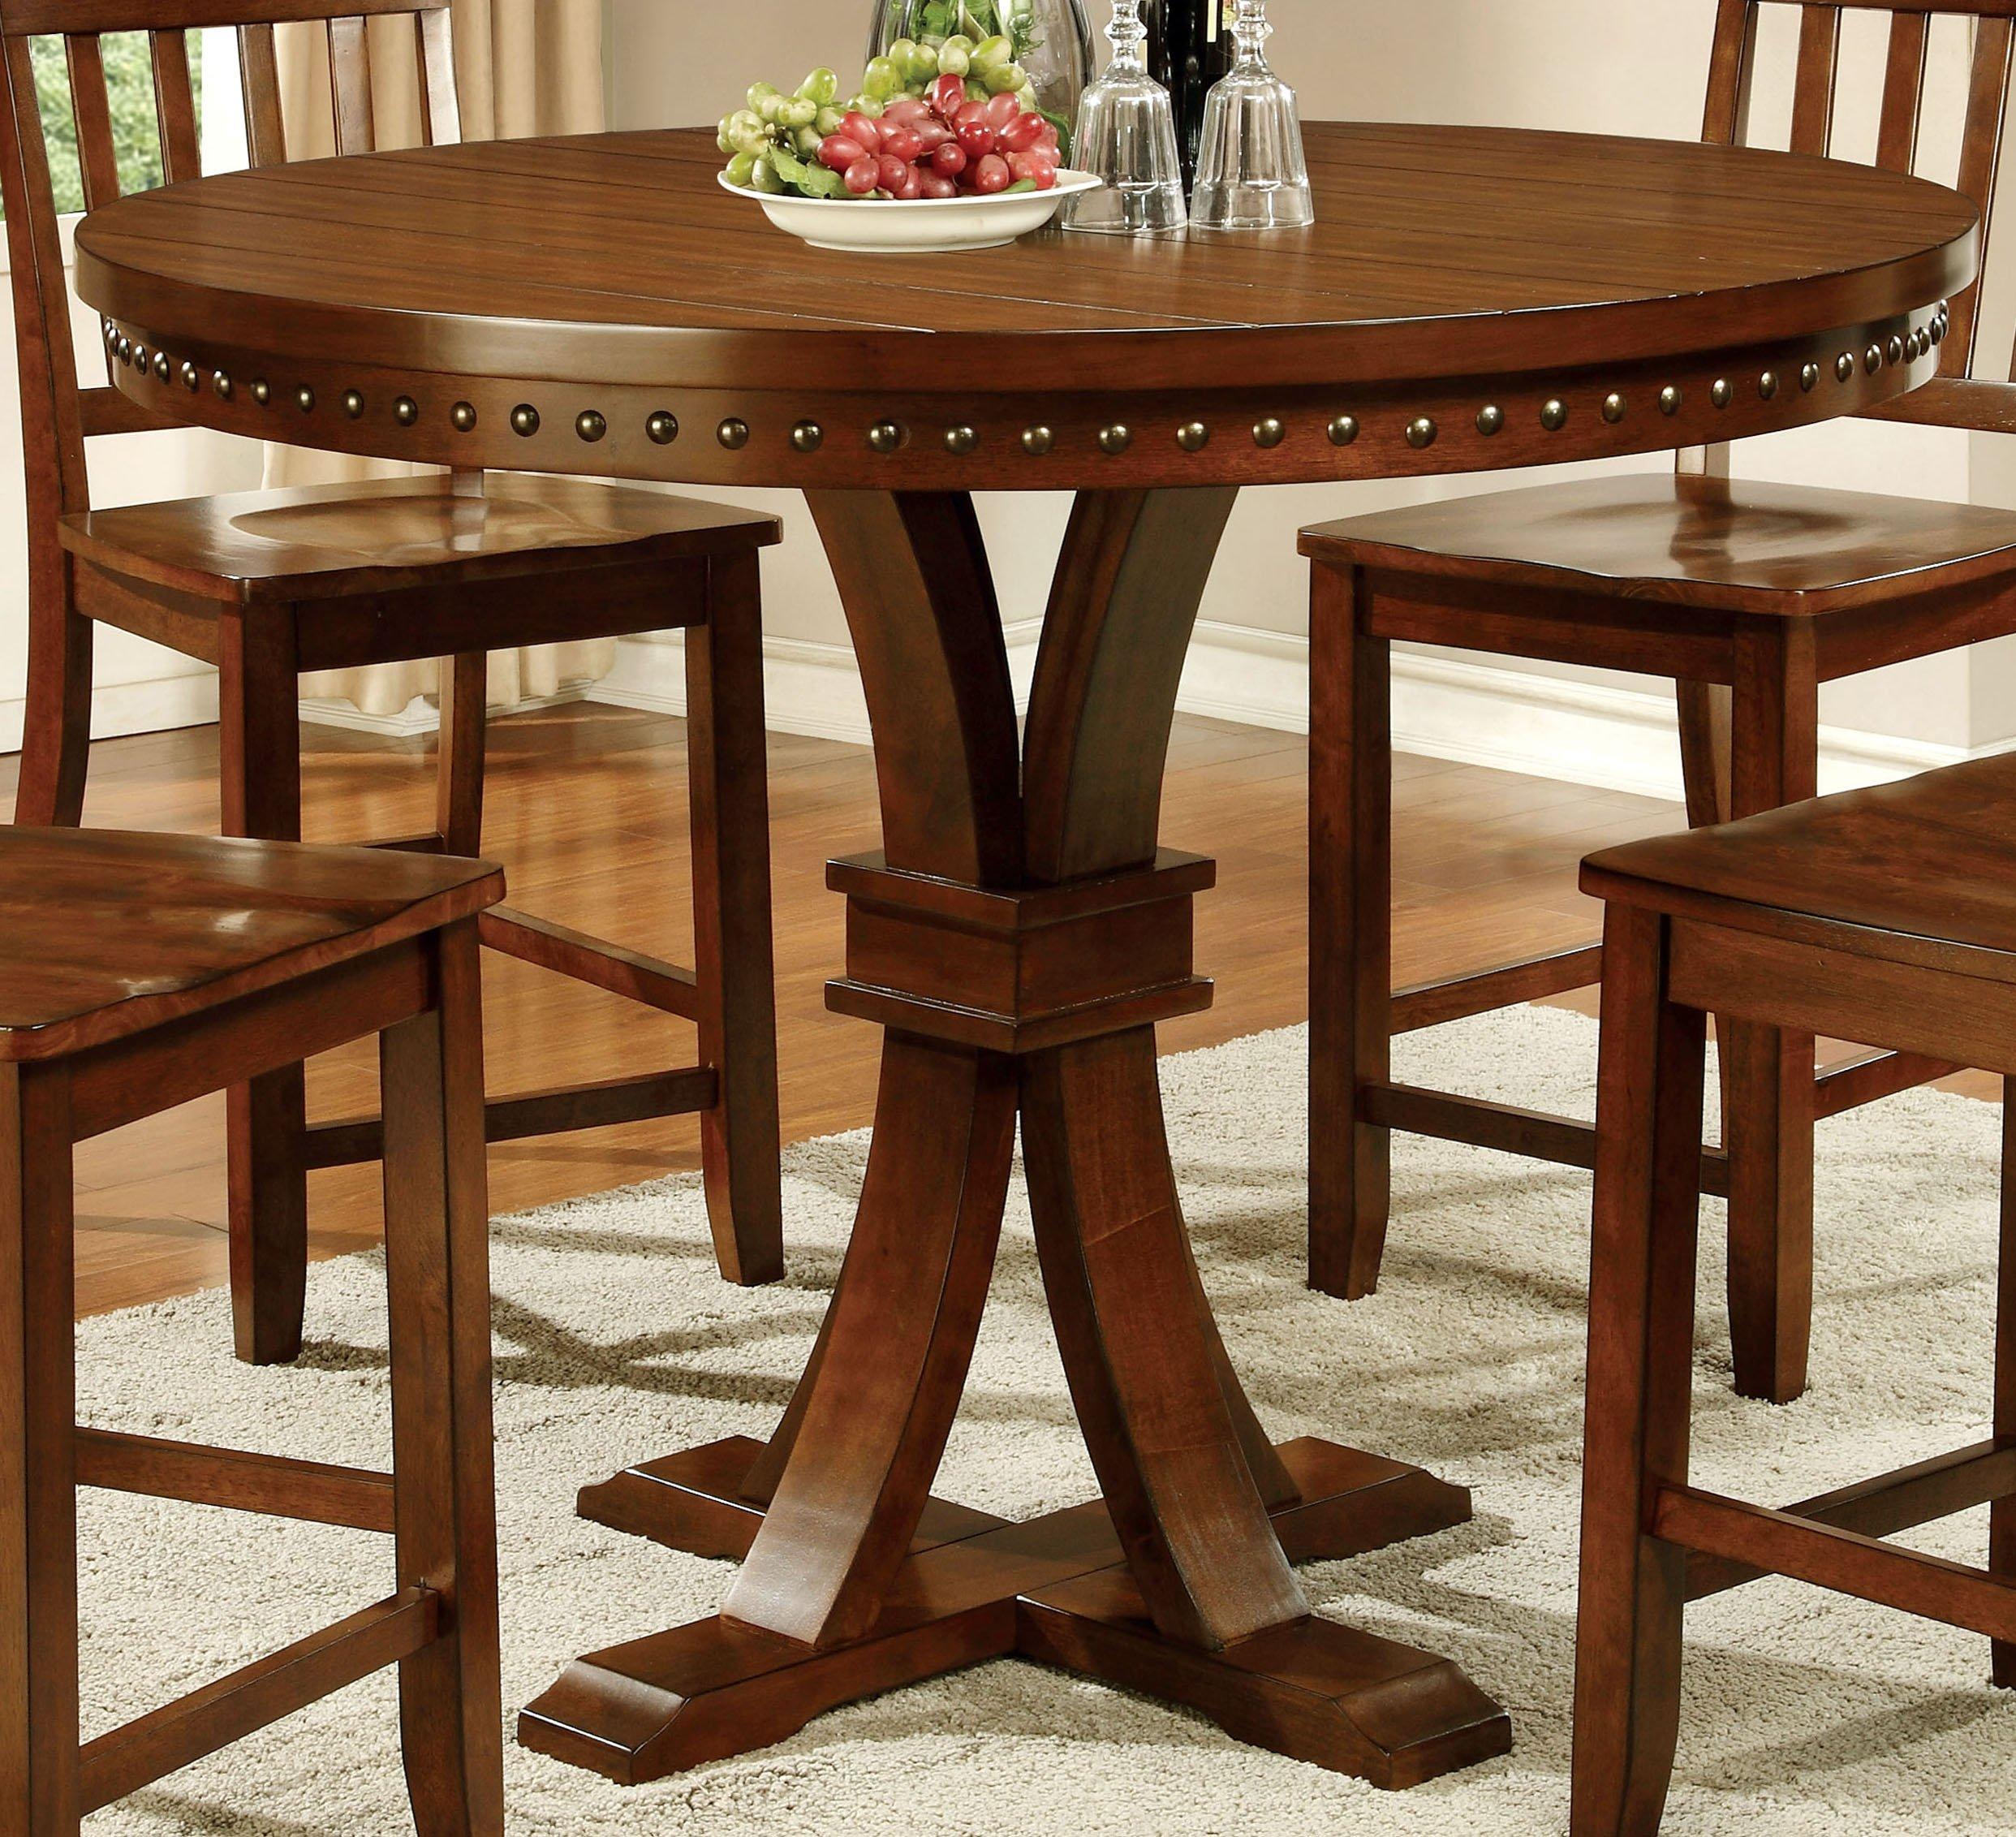 Furniture of America Castile Transitional Pub Table, Dark Oak